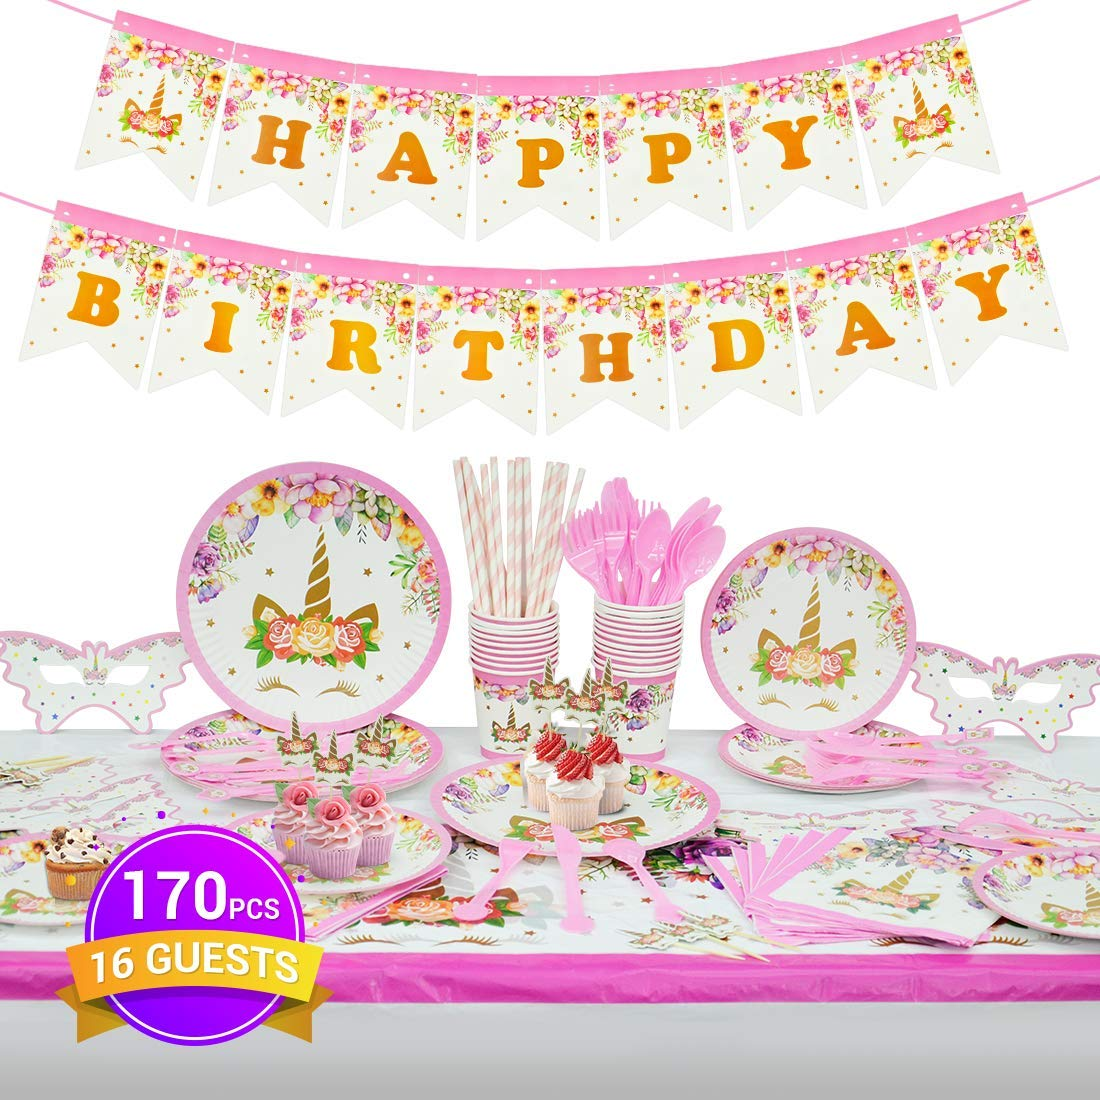 Unicorn Party Supplies,Binken Unicorn Party Decorations-170PCS Serve 16 Guests with Unicorn Plates,Birthday Banner,Napkins,Cups,Utensils,Cupcake Decorations,Unicorn Table Cloth for Birthday Party by Binken